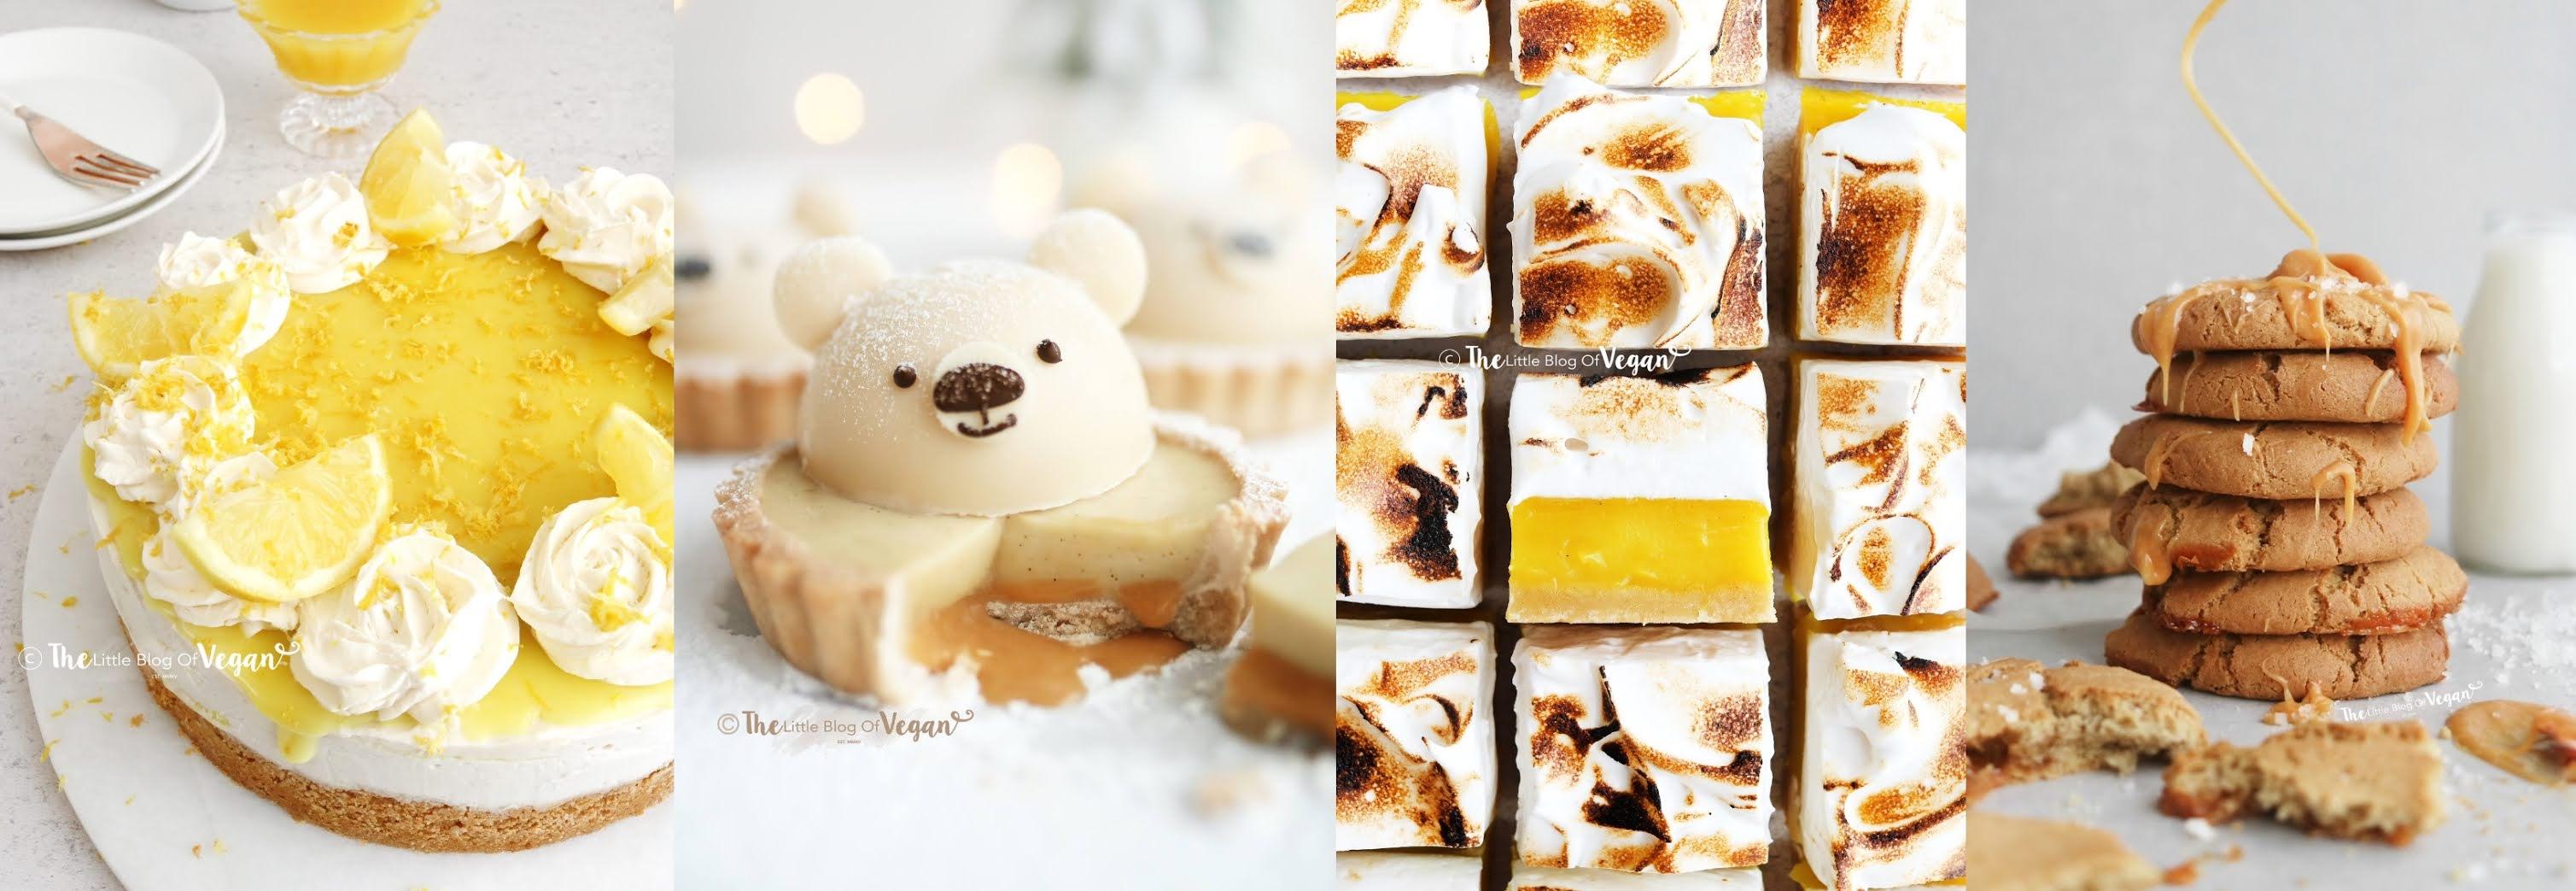 Collage of dessert recipes